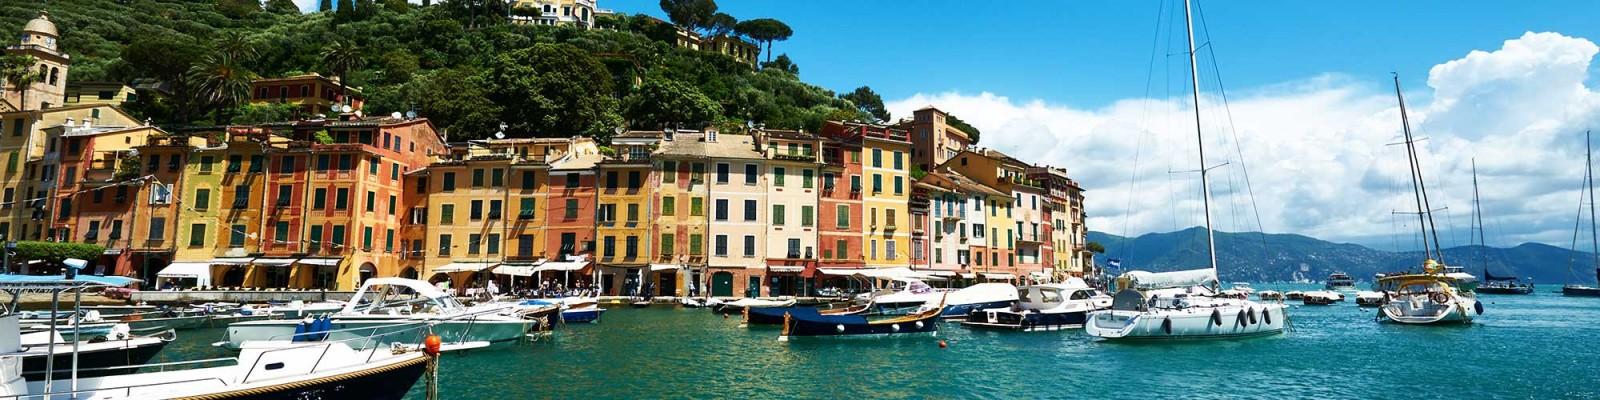 Tenrag Yacht Charter: Italian holidays